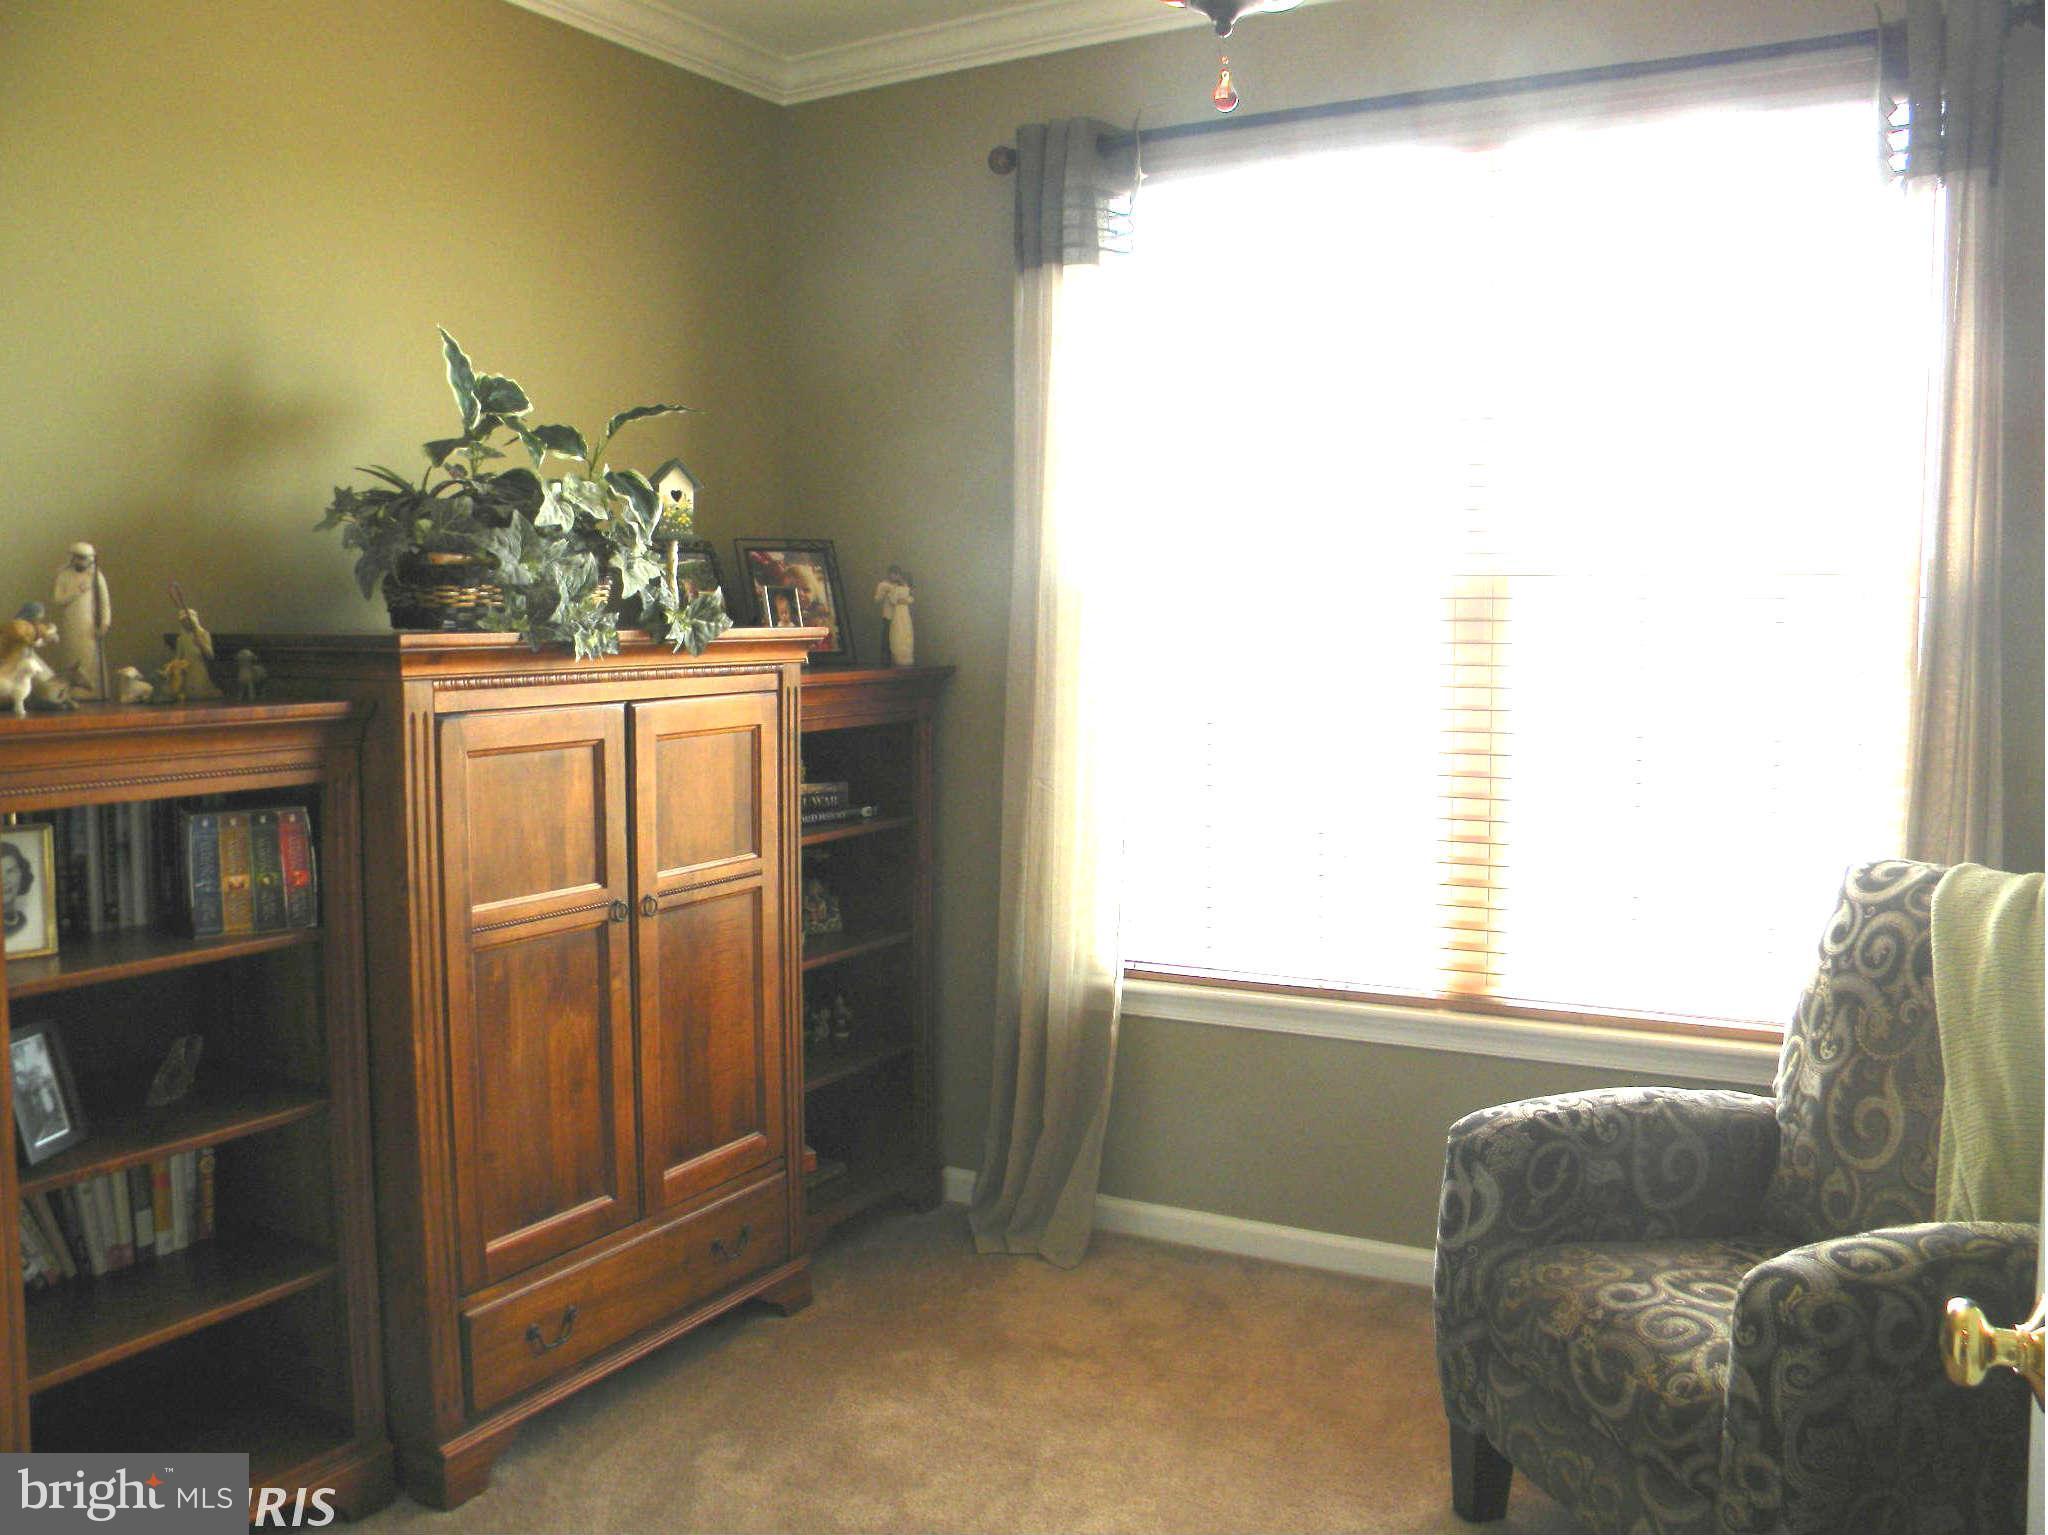 43865 HICKORY CORNER TER #105, Ashburn, VA 20147 $249,900